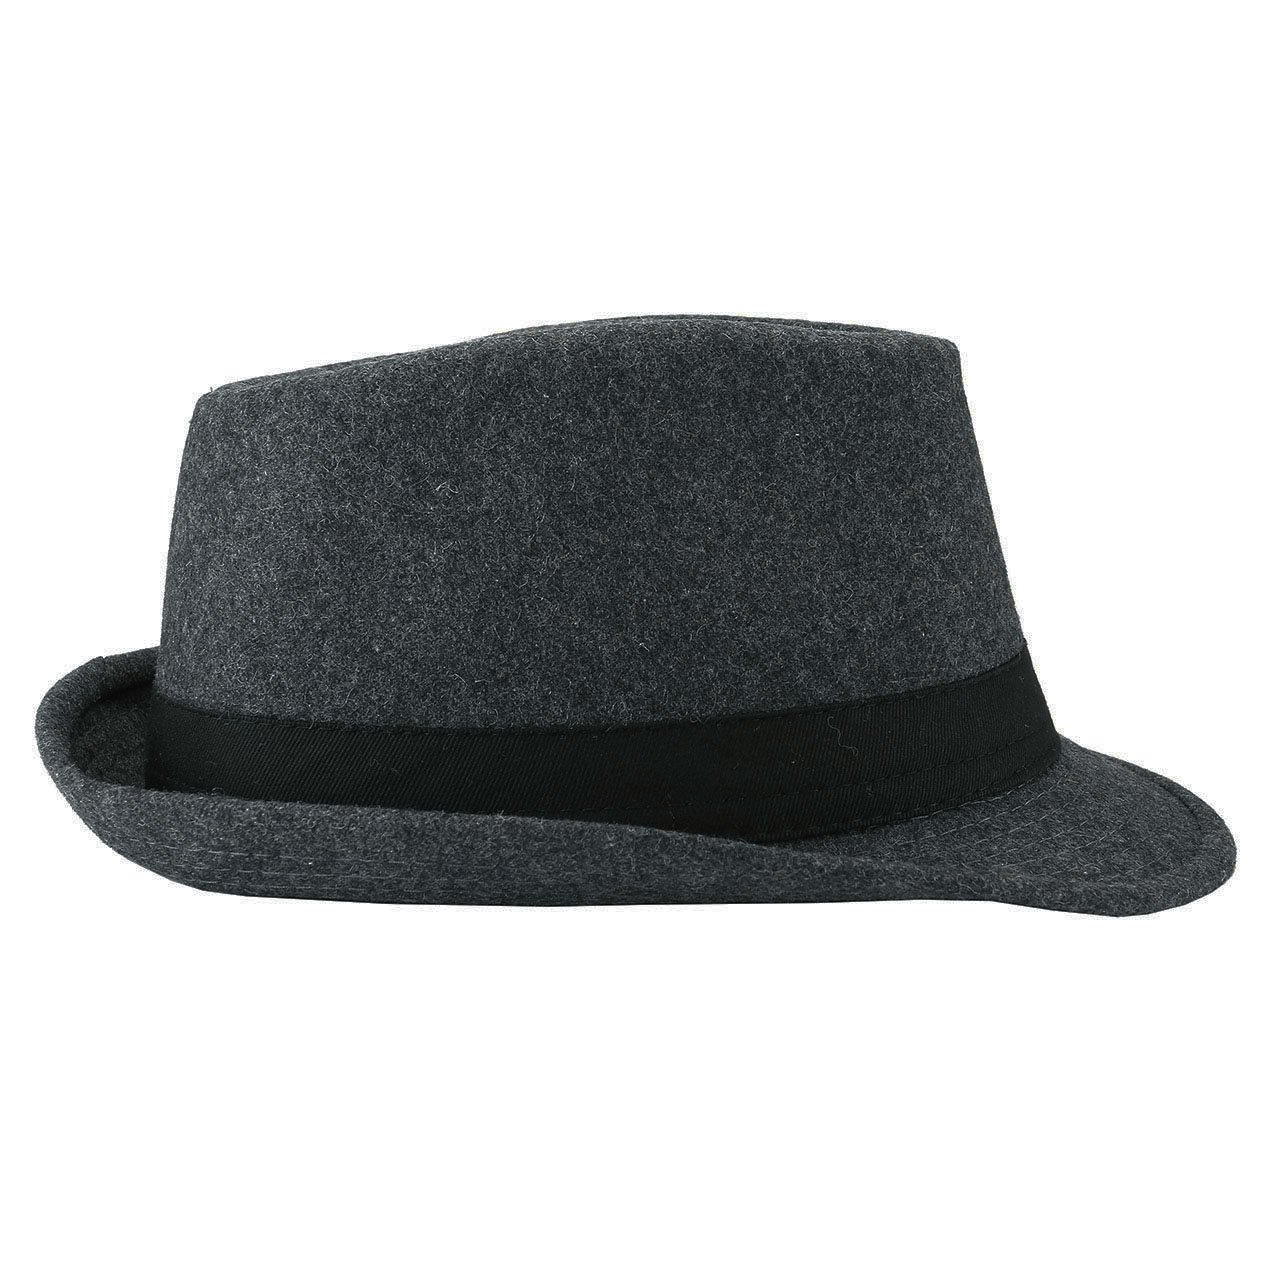 Unisex Classic Manhattan Fedora Hat Black Band Fashion Casual Jazz Wool Cap (Grey) by Faleto (Image #3)